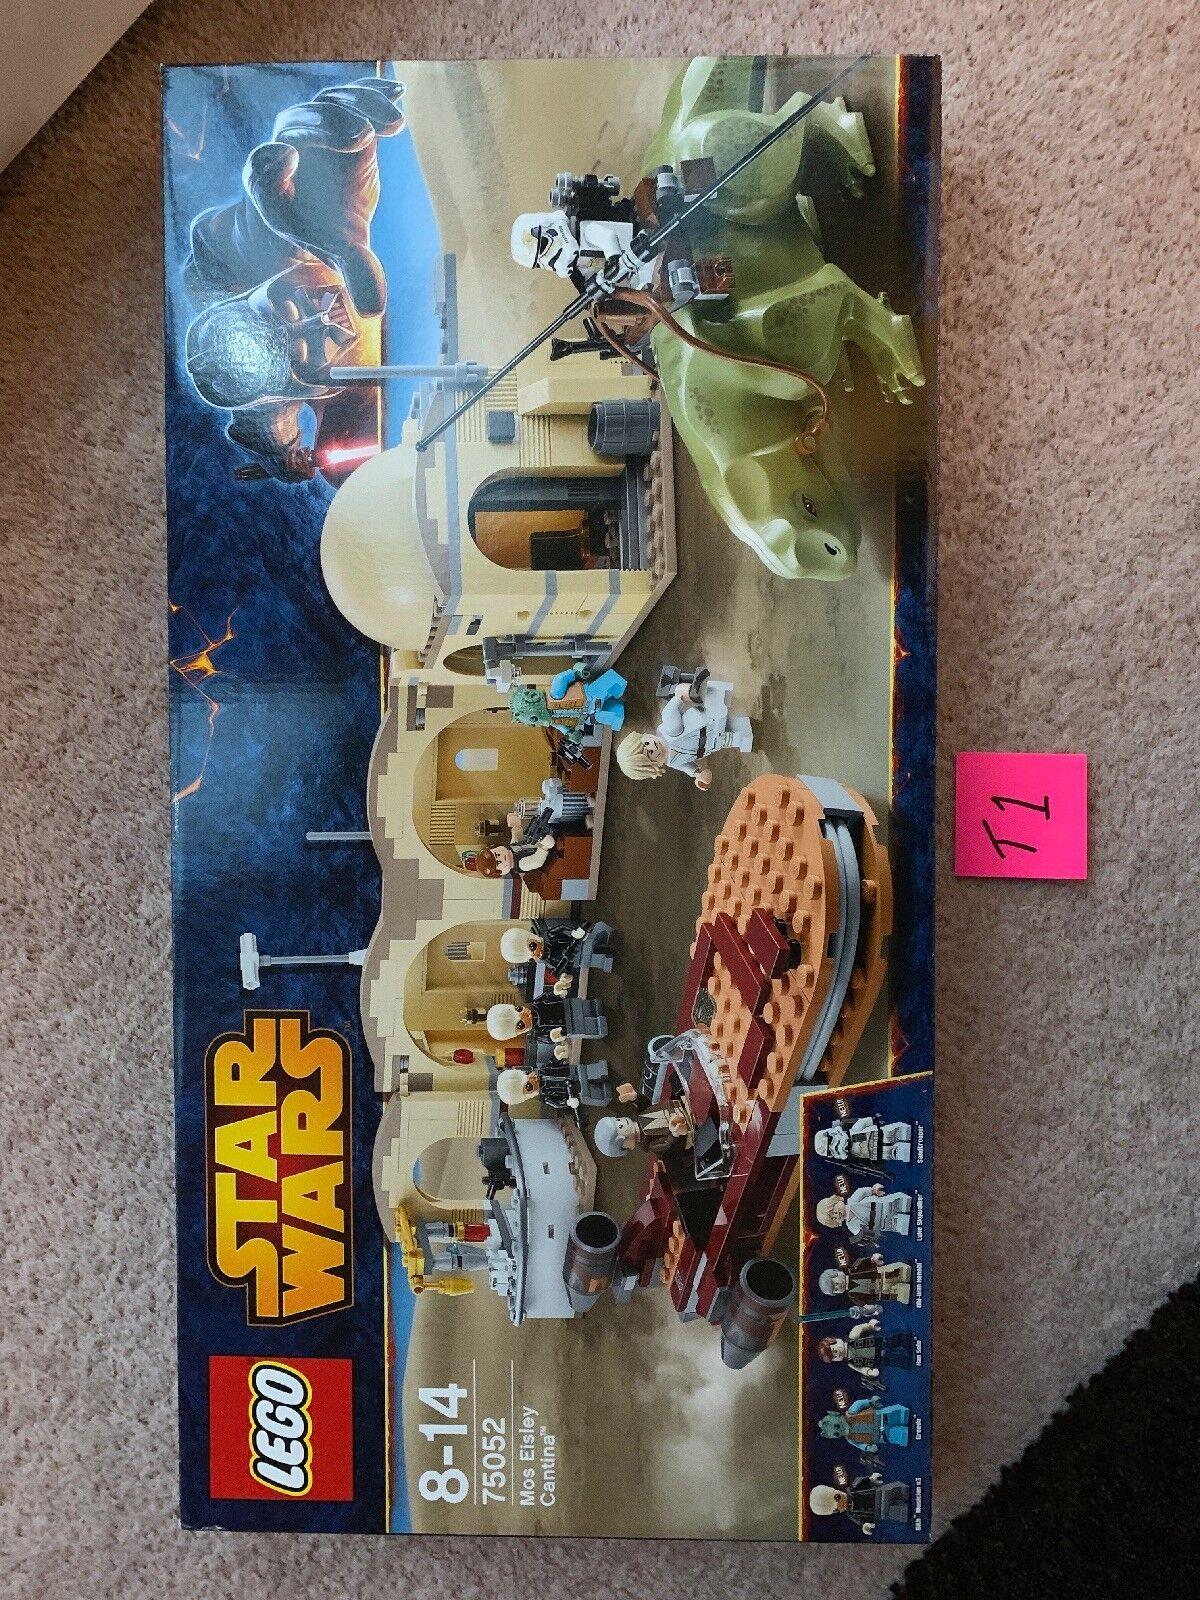 LEGO 75052 Star Wars Mos Eisley Cantina - Retired 2014 BNISB Factory sealed - T1